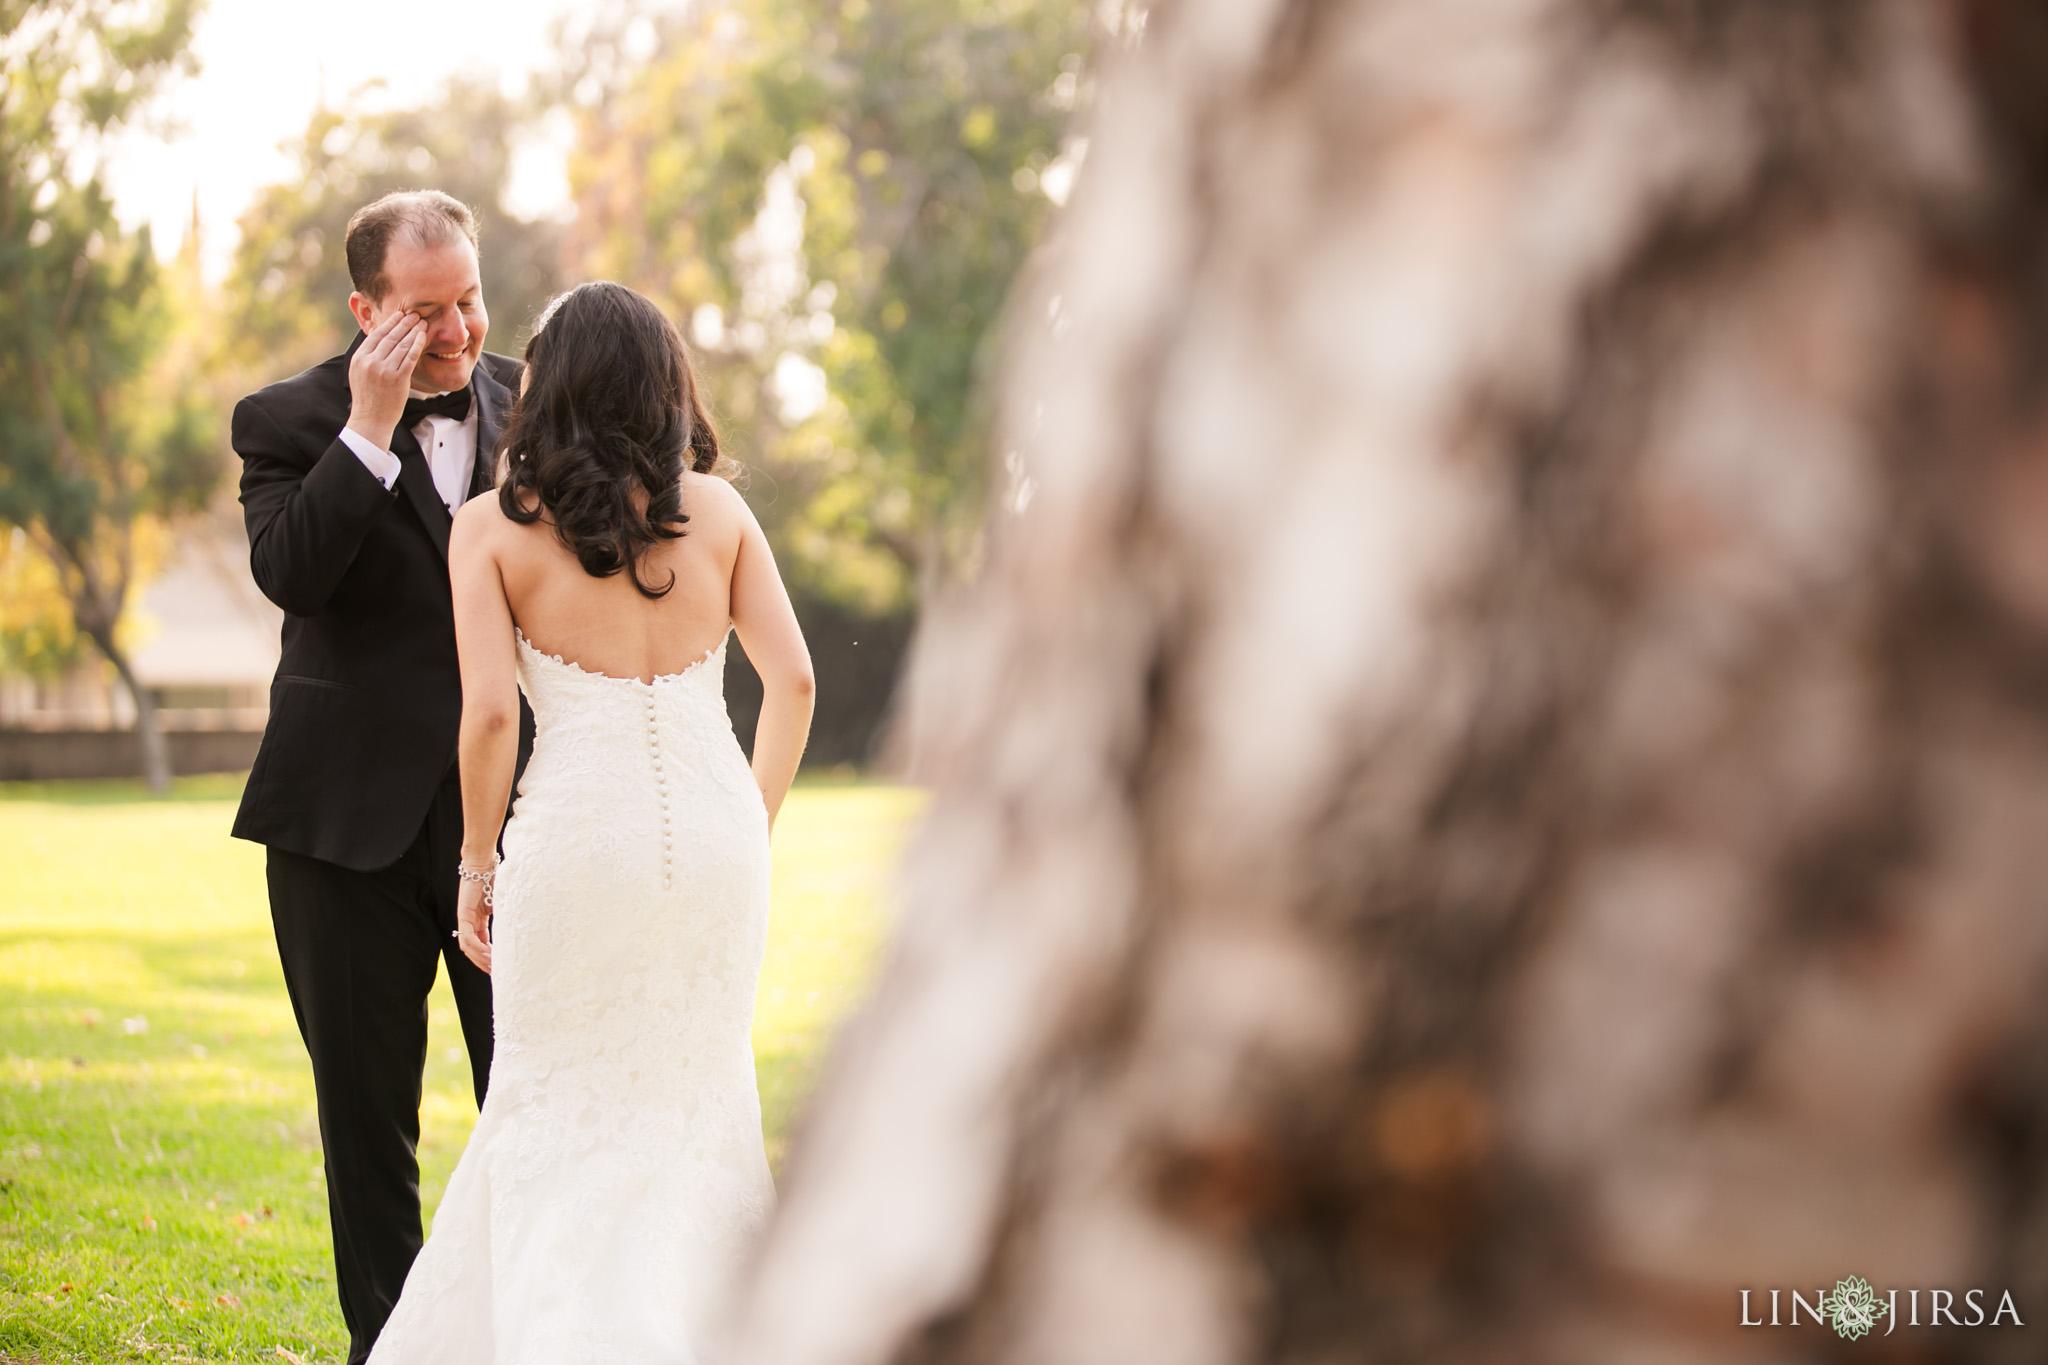 13 vertigo banquet hall glendale wedding photography